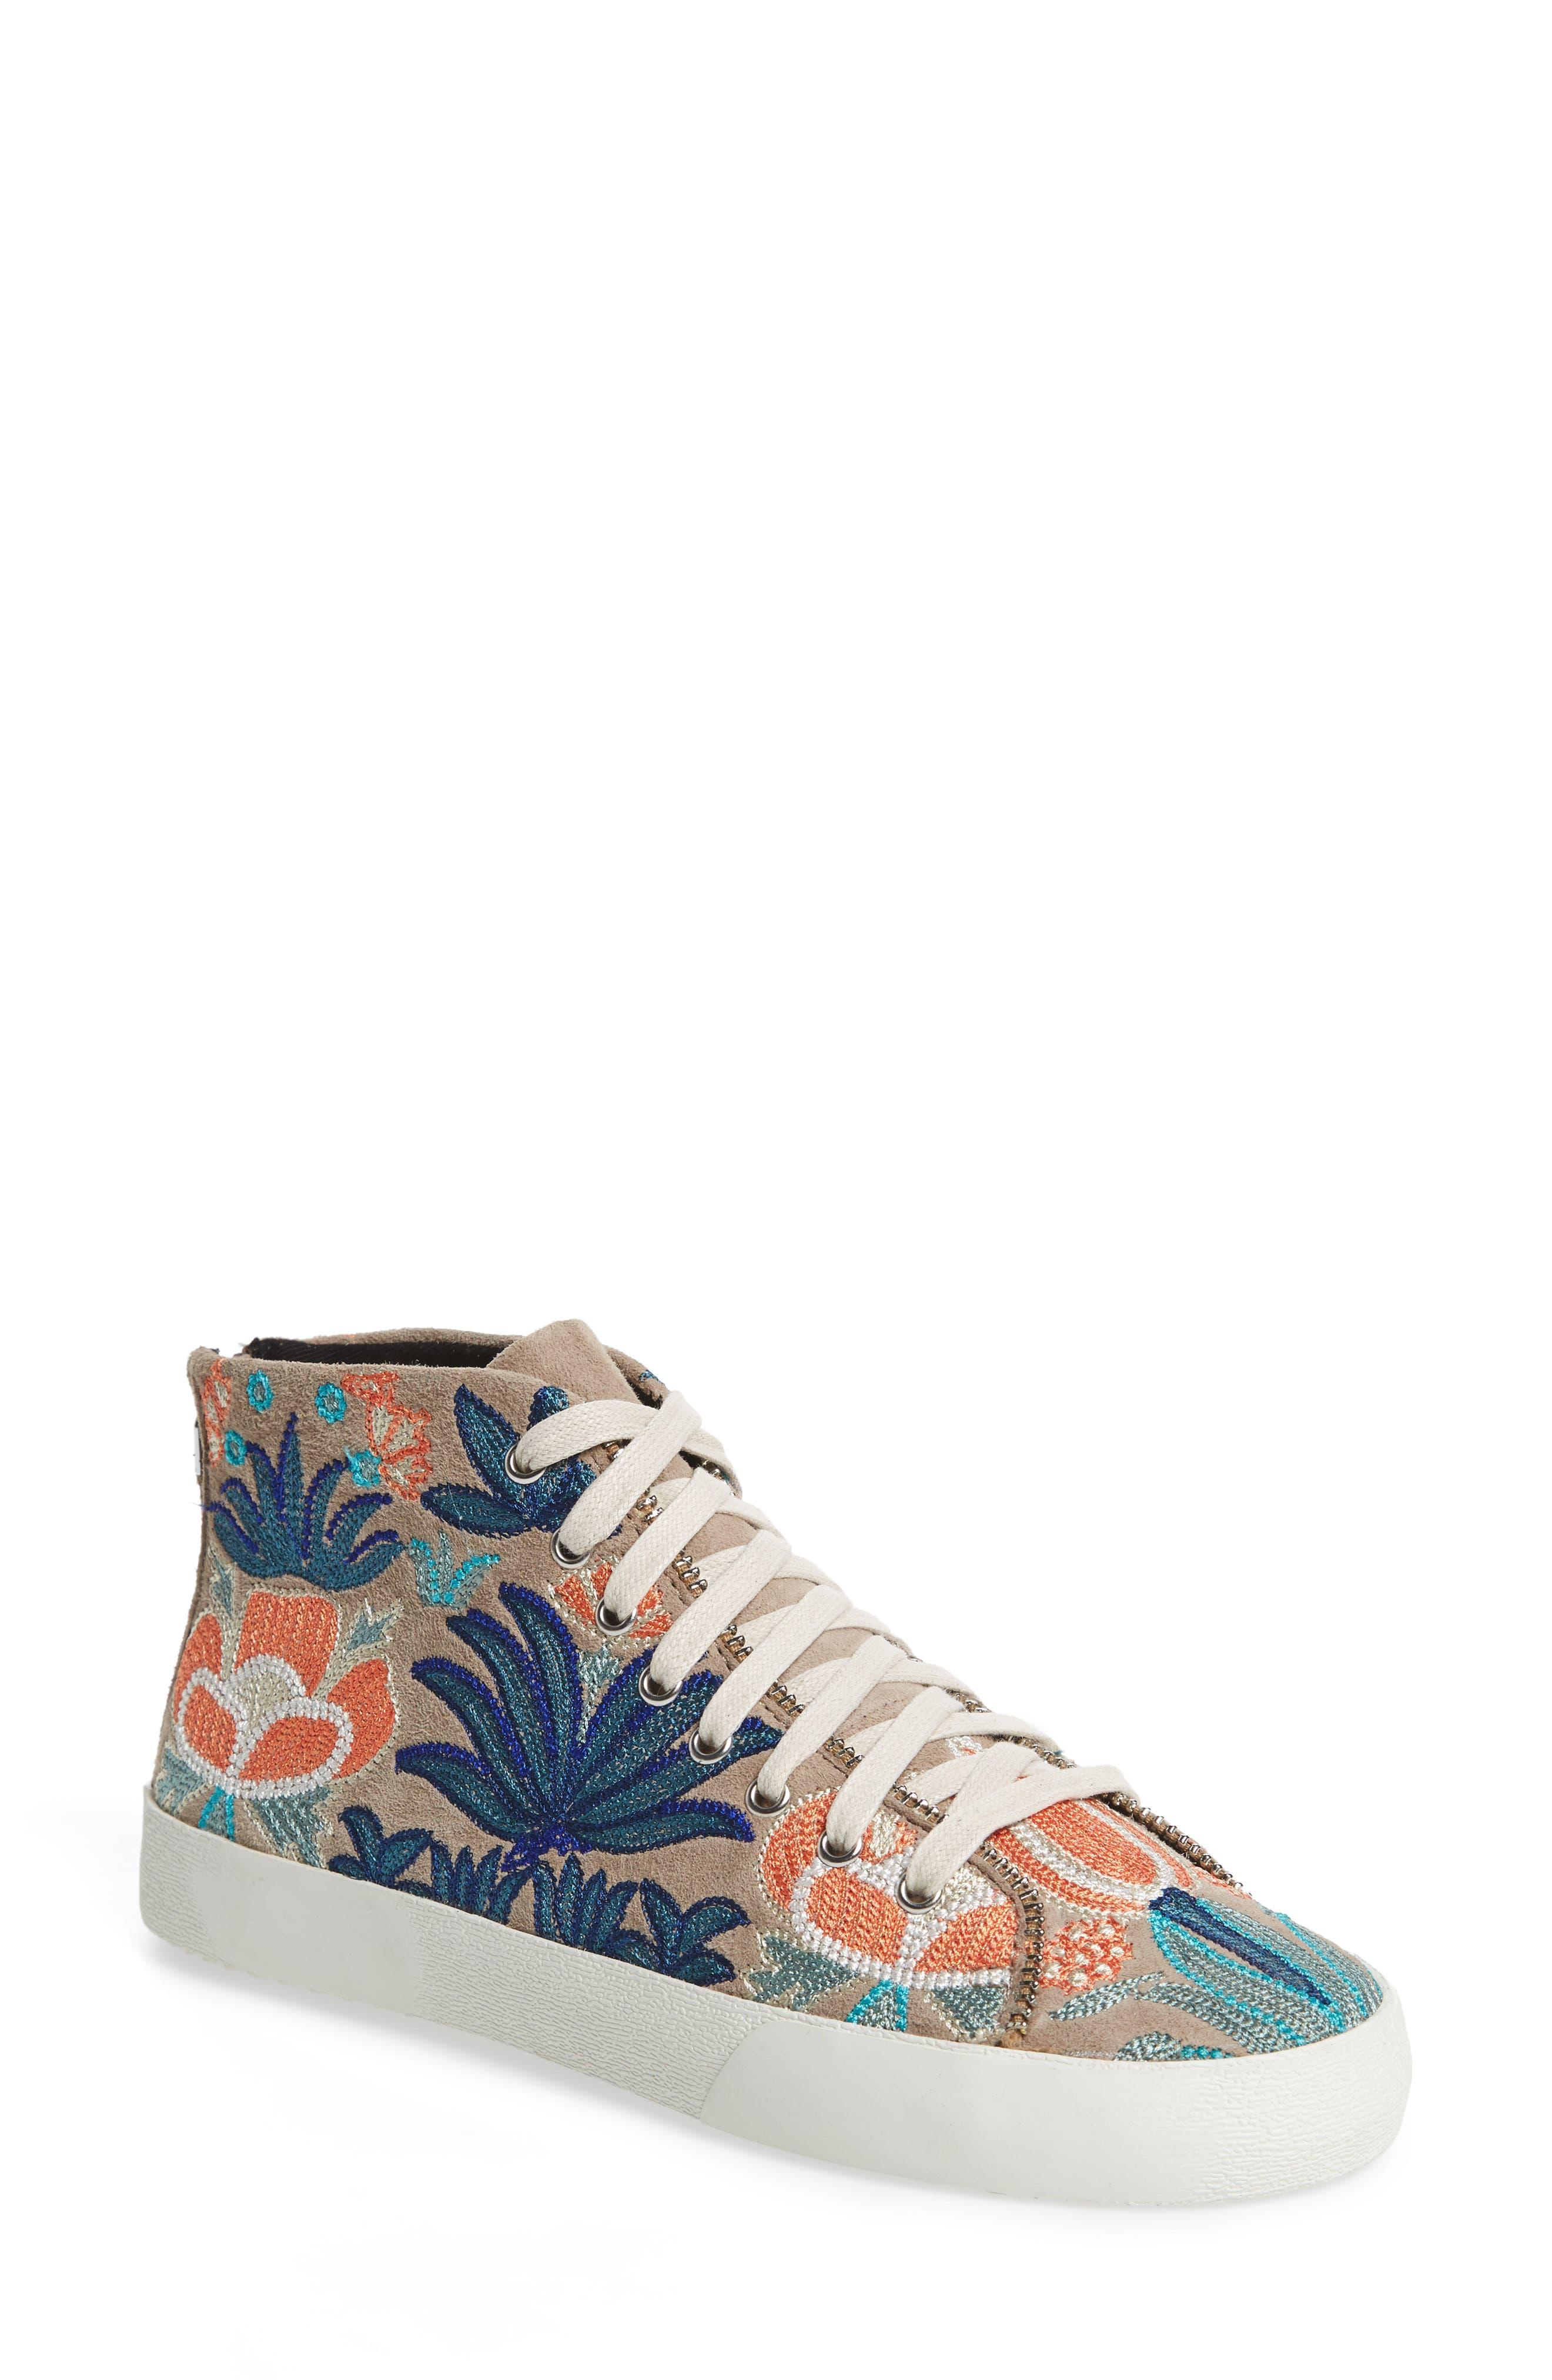 REBECCA MINKOFF Zaina Embroidered Sneaker